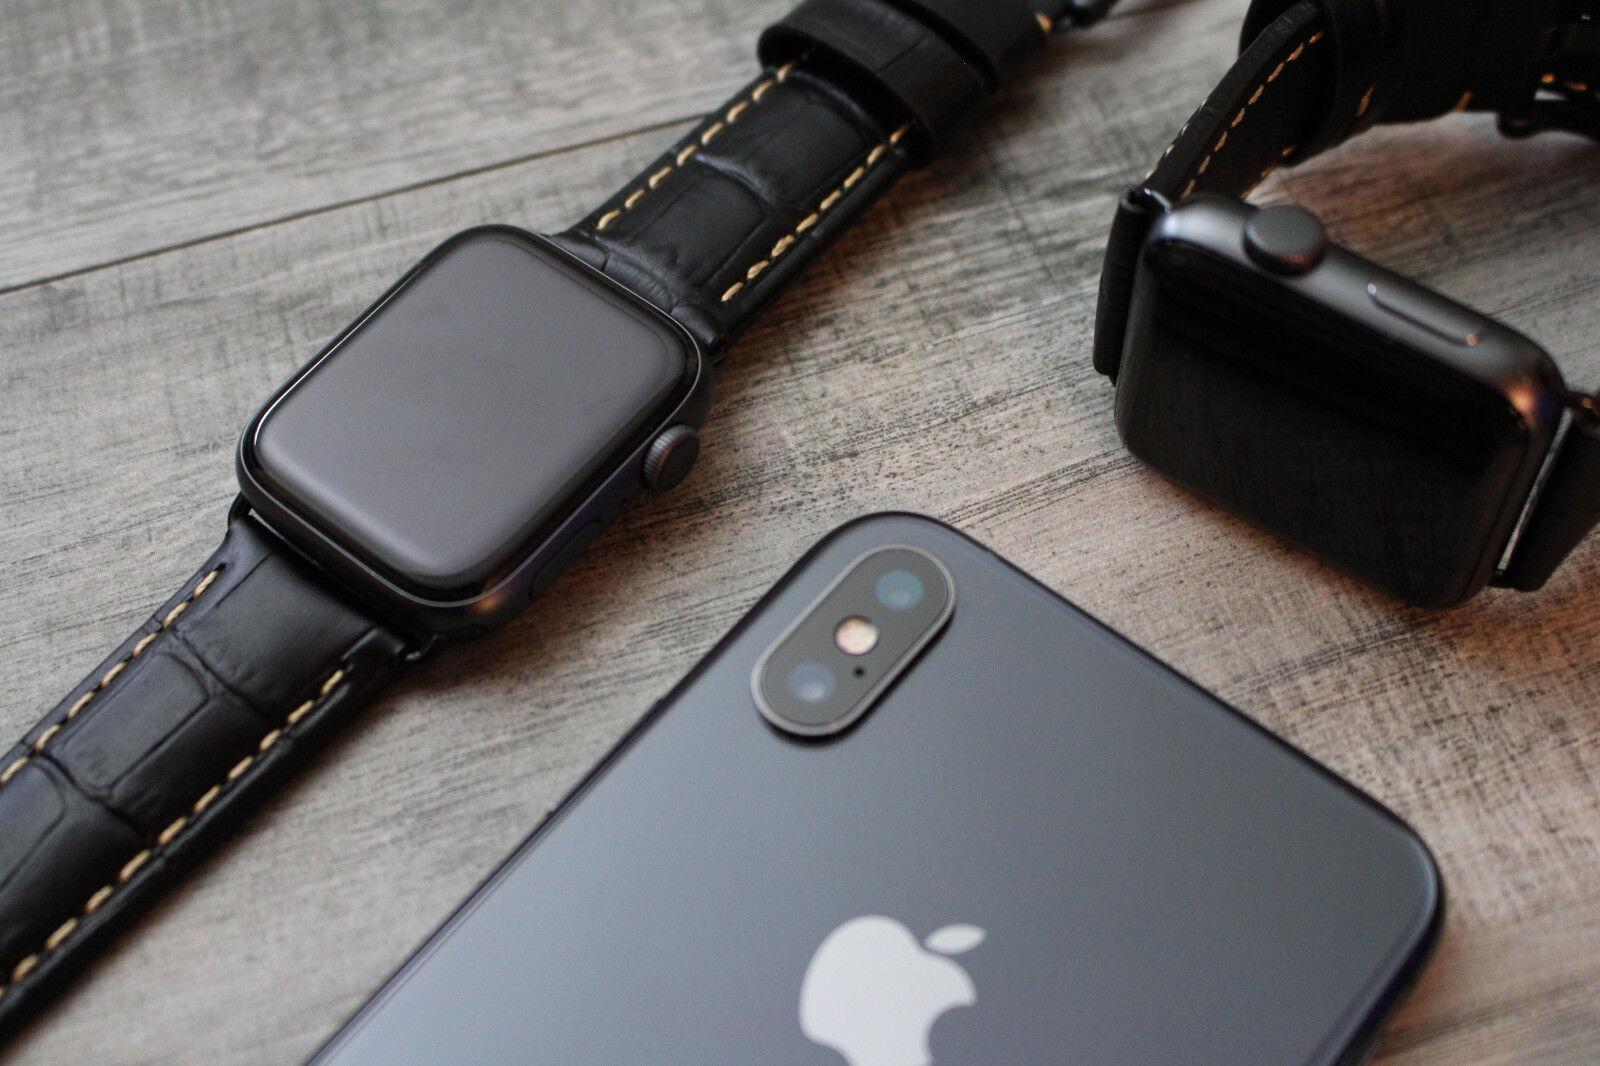 iwatch: Per Orologio Apple Serie 6 5 Se 42/44mm Nero Croc Stile Pelle Cinturino Iwatch